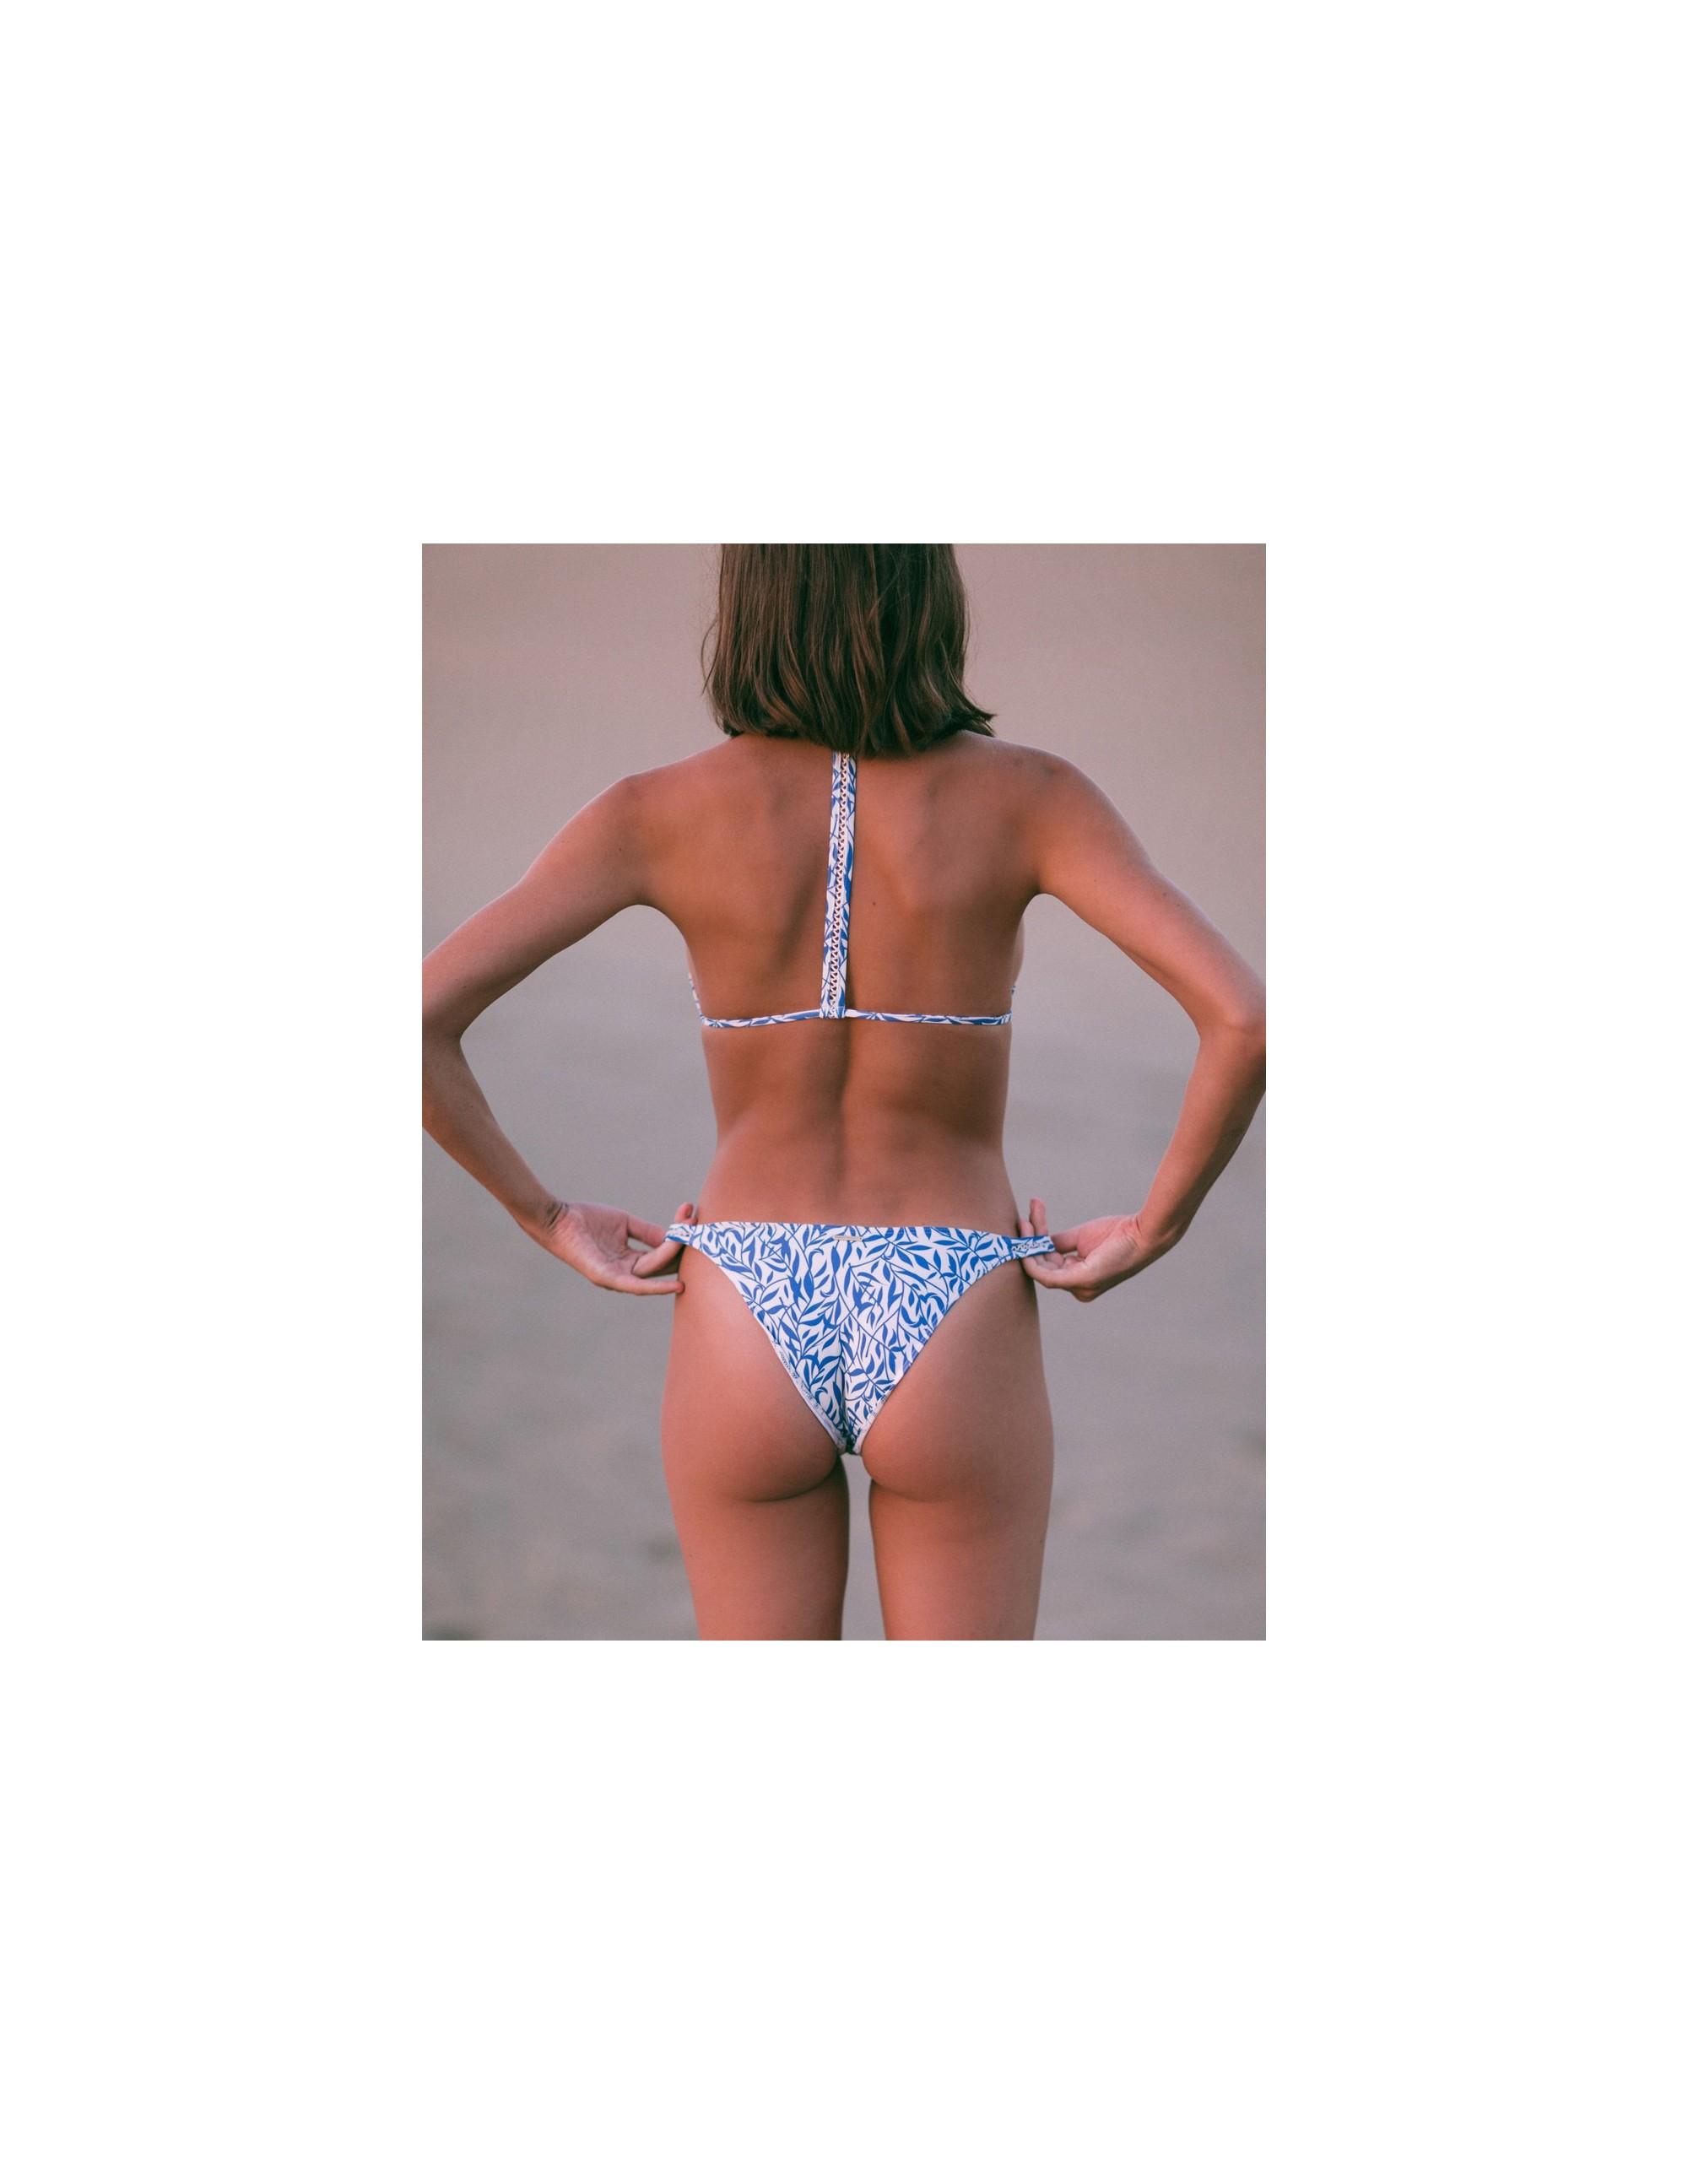 ANAMUR bikini top - FLORAL BLUE